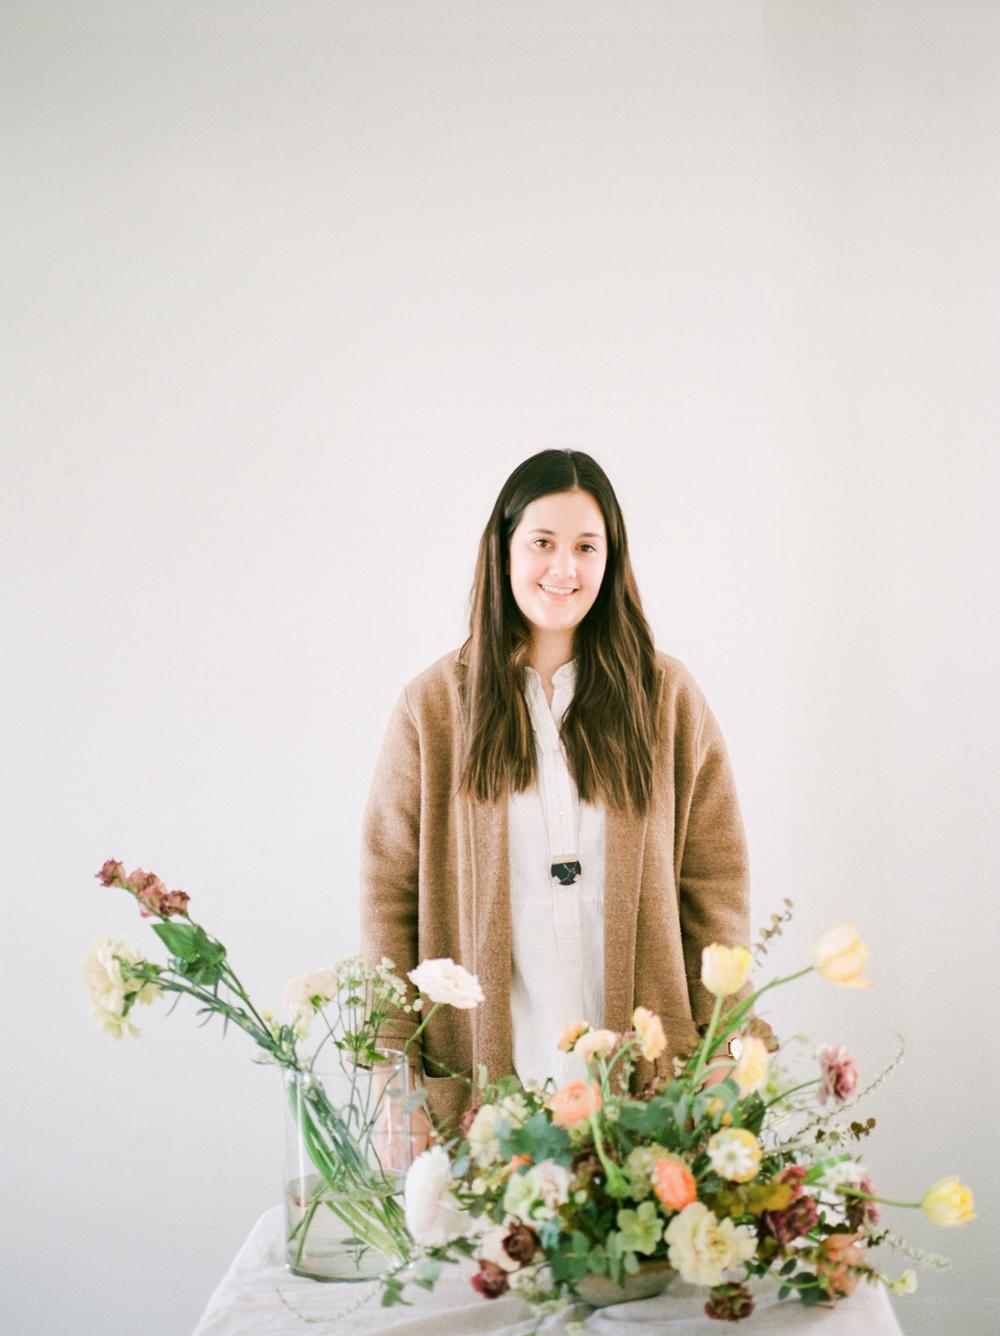 Christine-Gosch-Lexie-Sandberg-Carpe-diem-flowers-florals-design-wedding-flowers-salt-lake-city-branding-photos-styling-bridal-bouquet-centerpieces-film-photographer-6.jpg